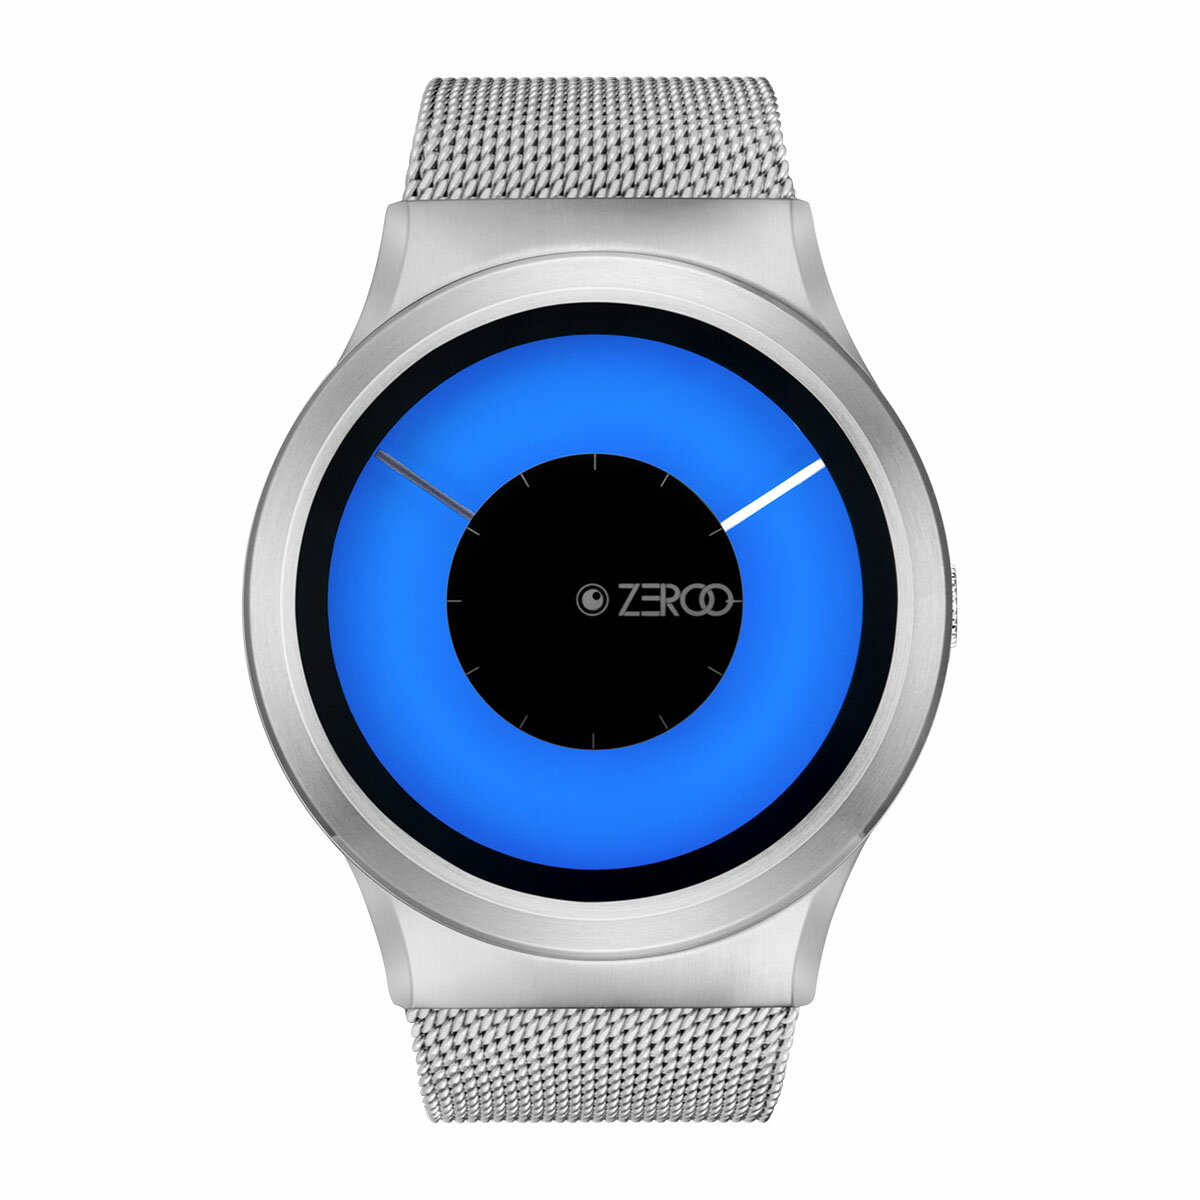 ZEROO MAGIA AURORA ゼロ 電池式クォーツ 腕時計 [W11026B01SM01] ブルー デザインウォッチ ペア用 メンズ レディース ユニセックス おしゃれ時計 デザイナーズ